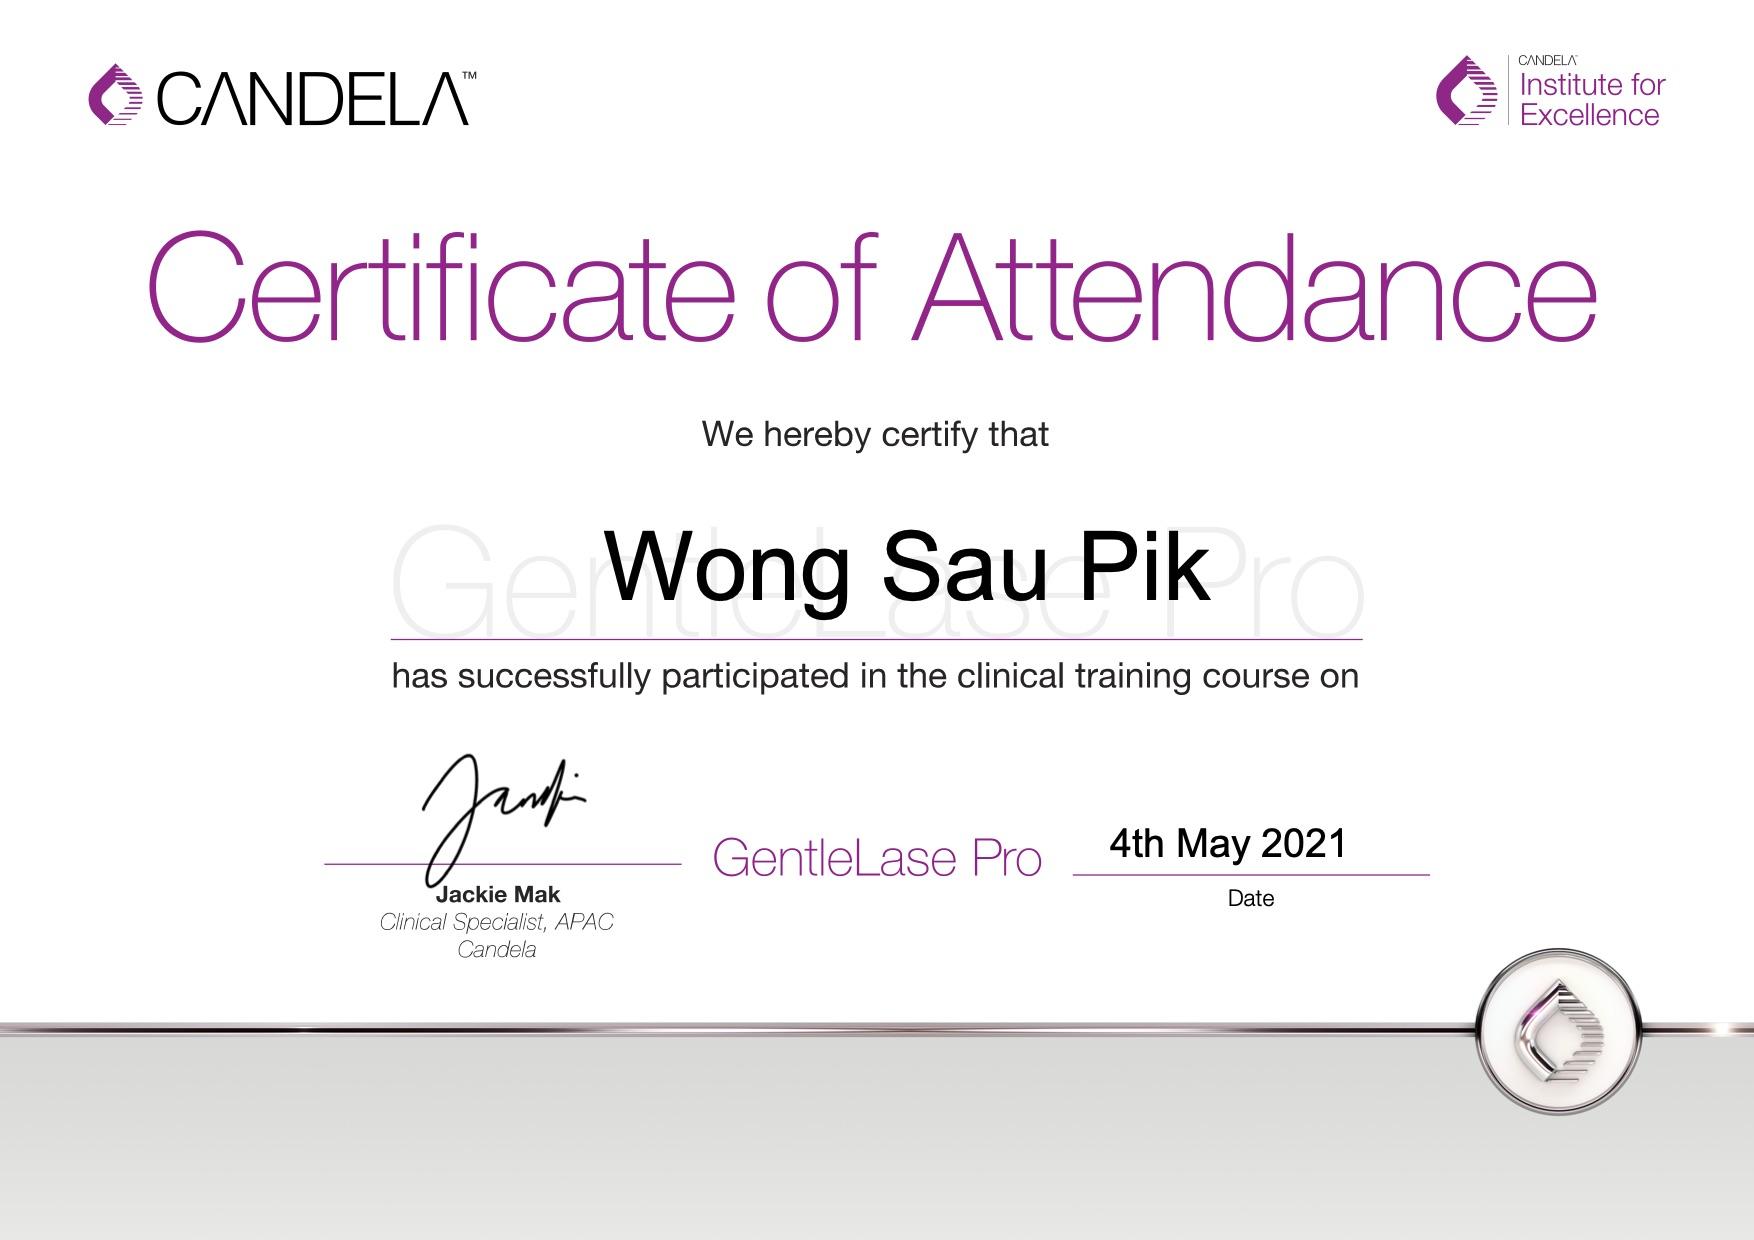 GentleLase_Pro_Certifcate_WongSauPik(Yanis)